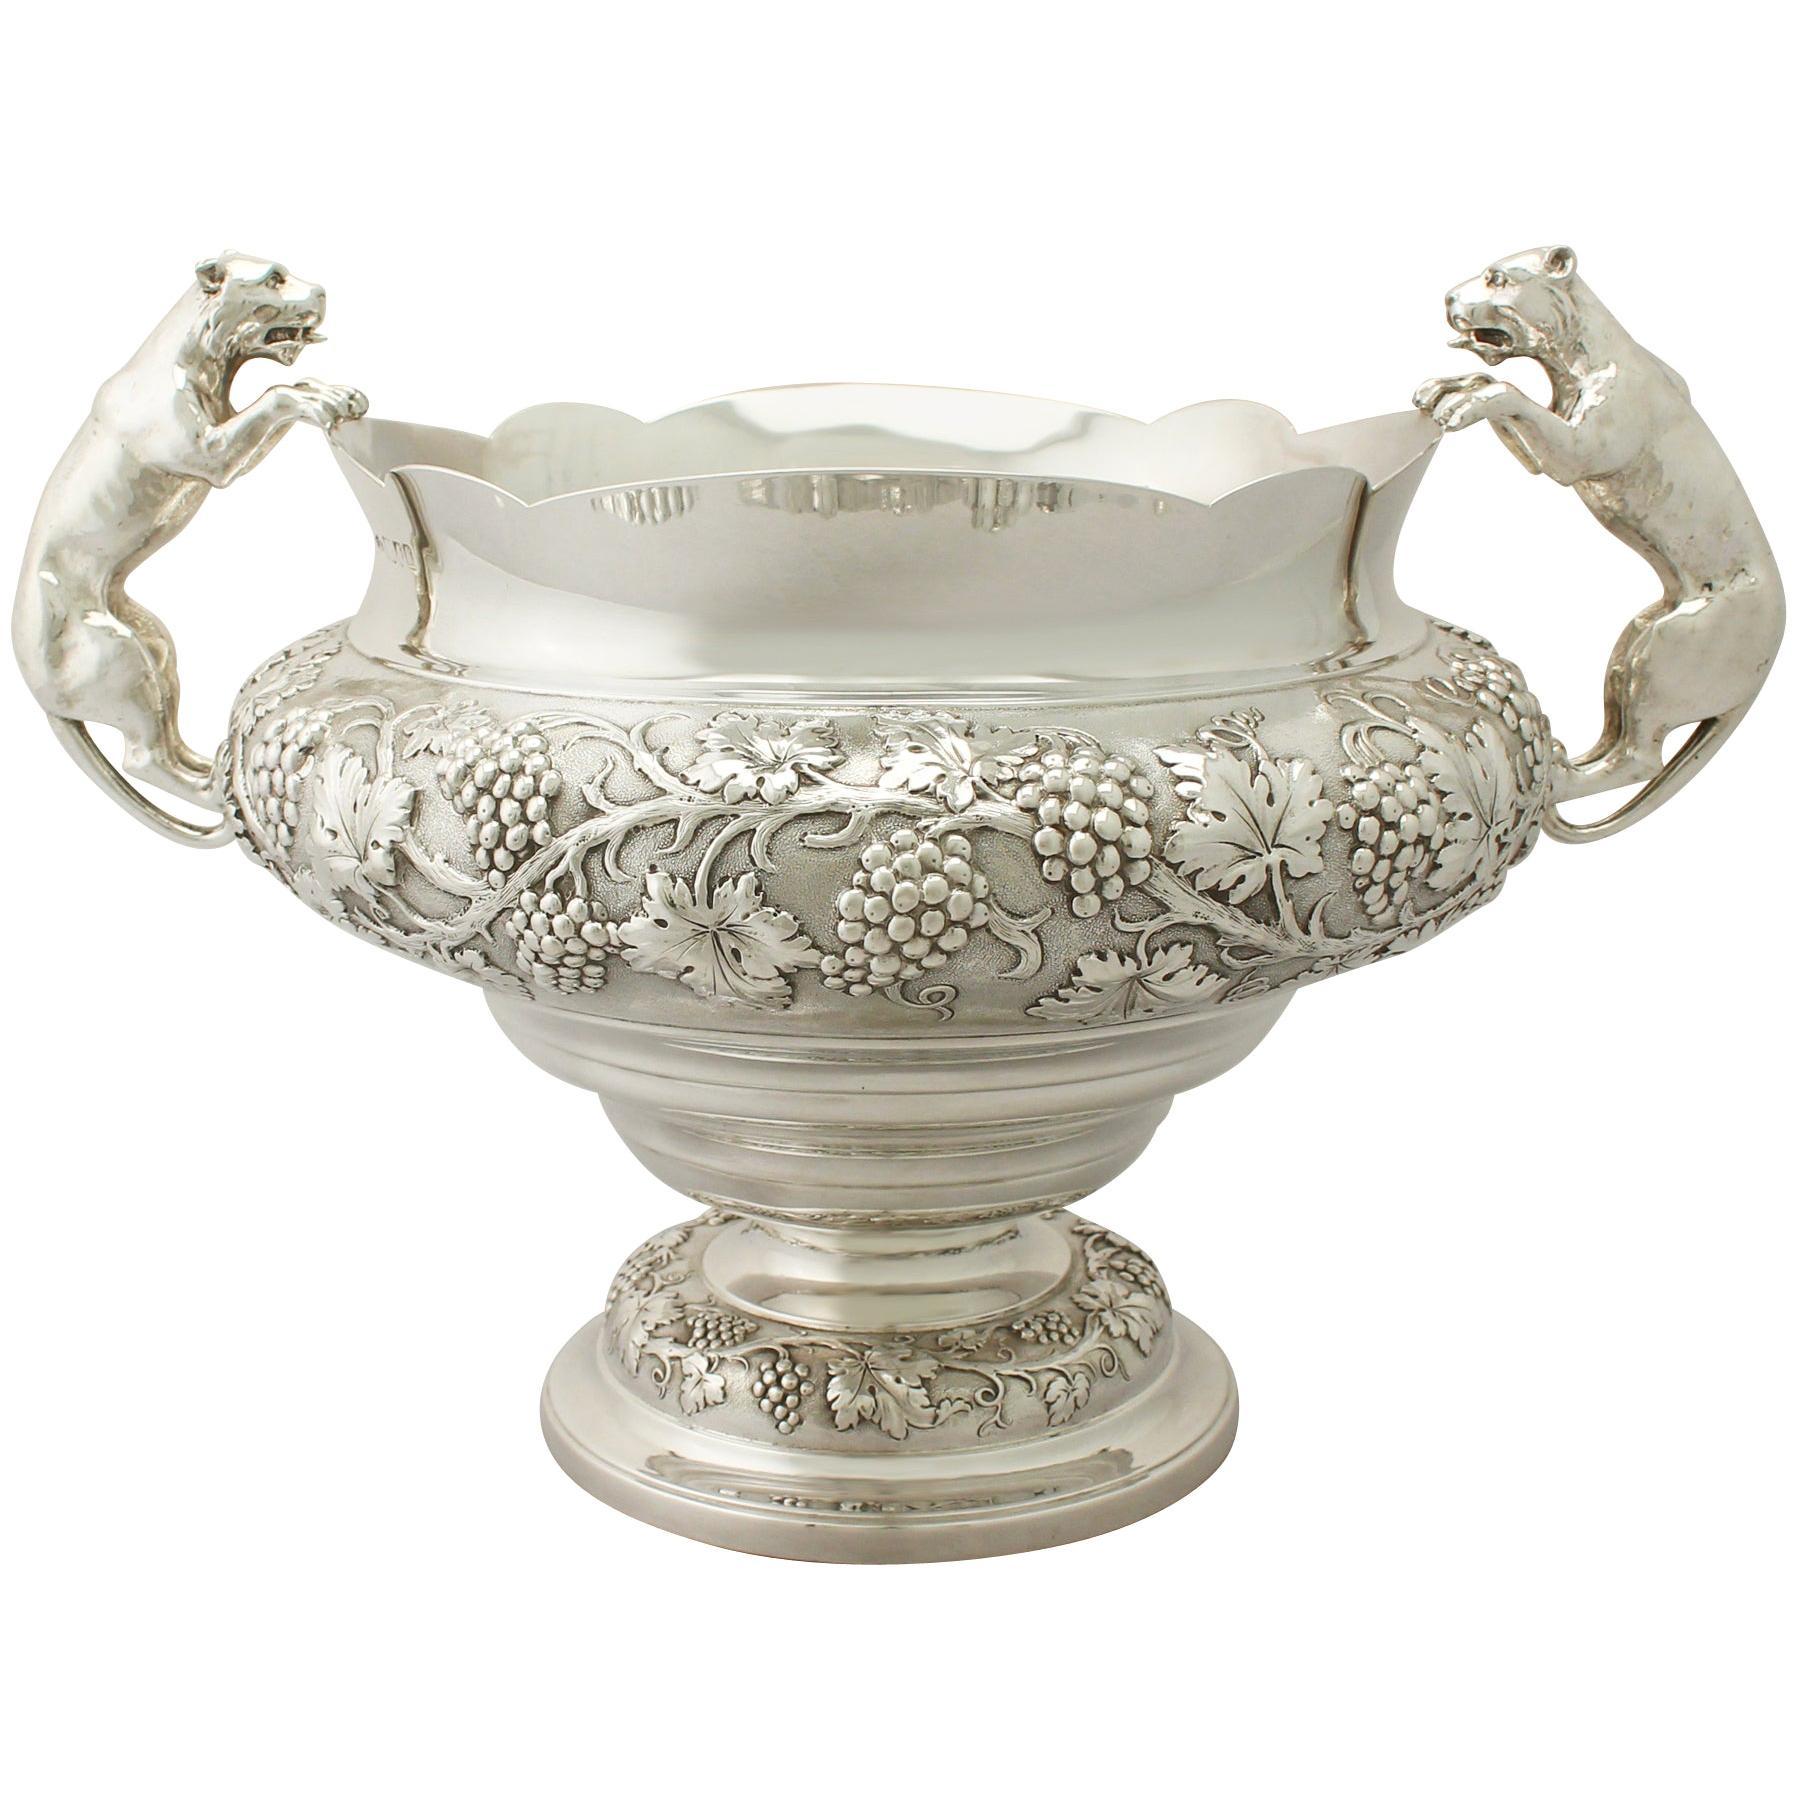 Antique Sterling Silver Presentation Bowl